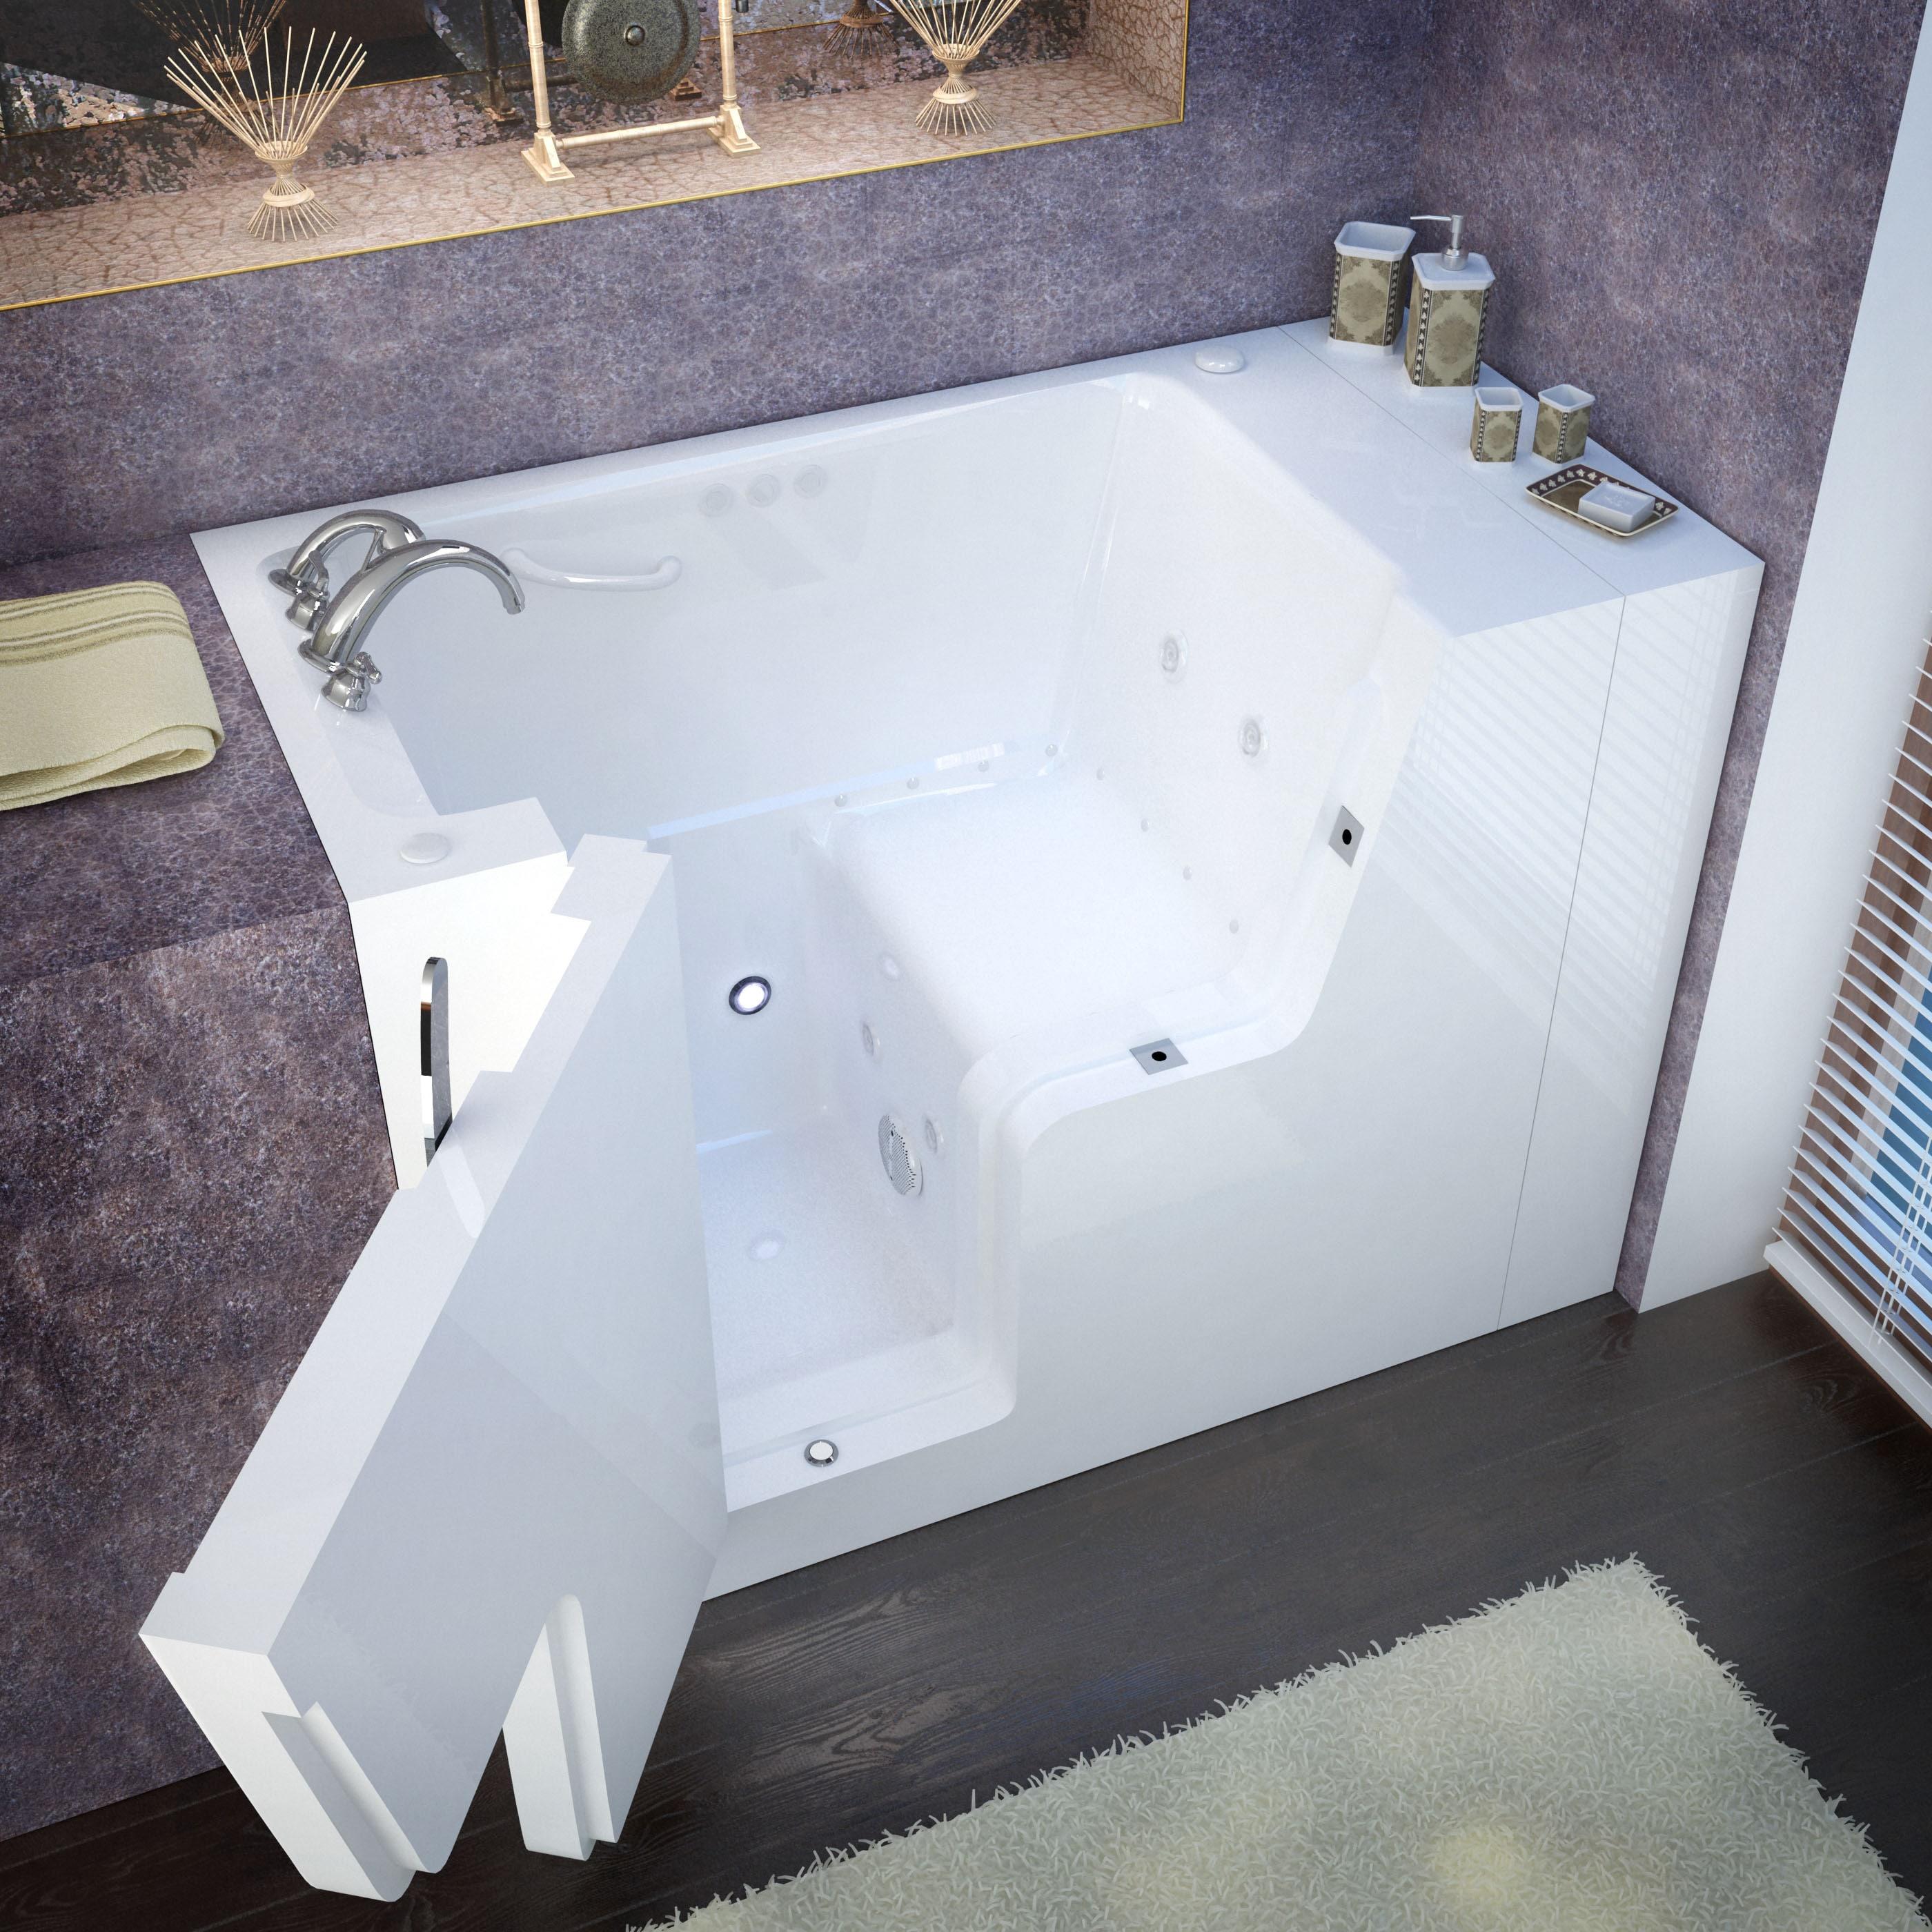 MediTub Wheelchair Accessible 29x53-inch Left Drain White Whirlpool ...